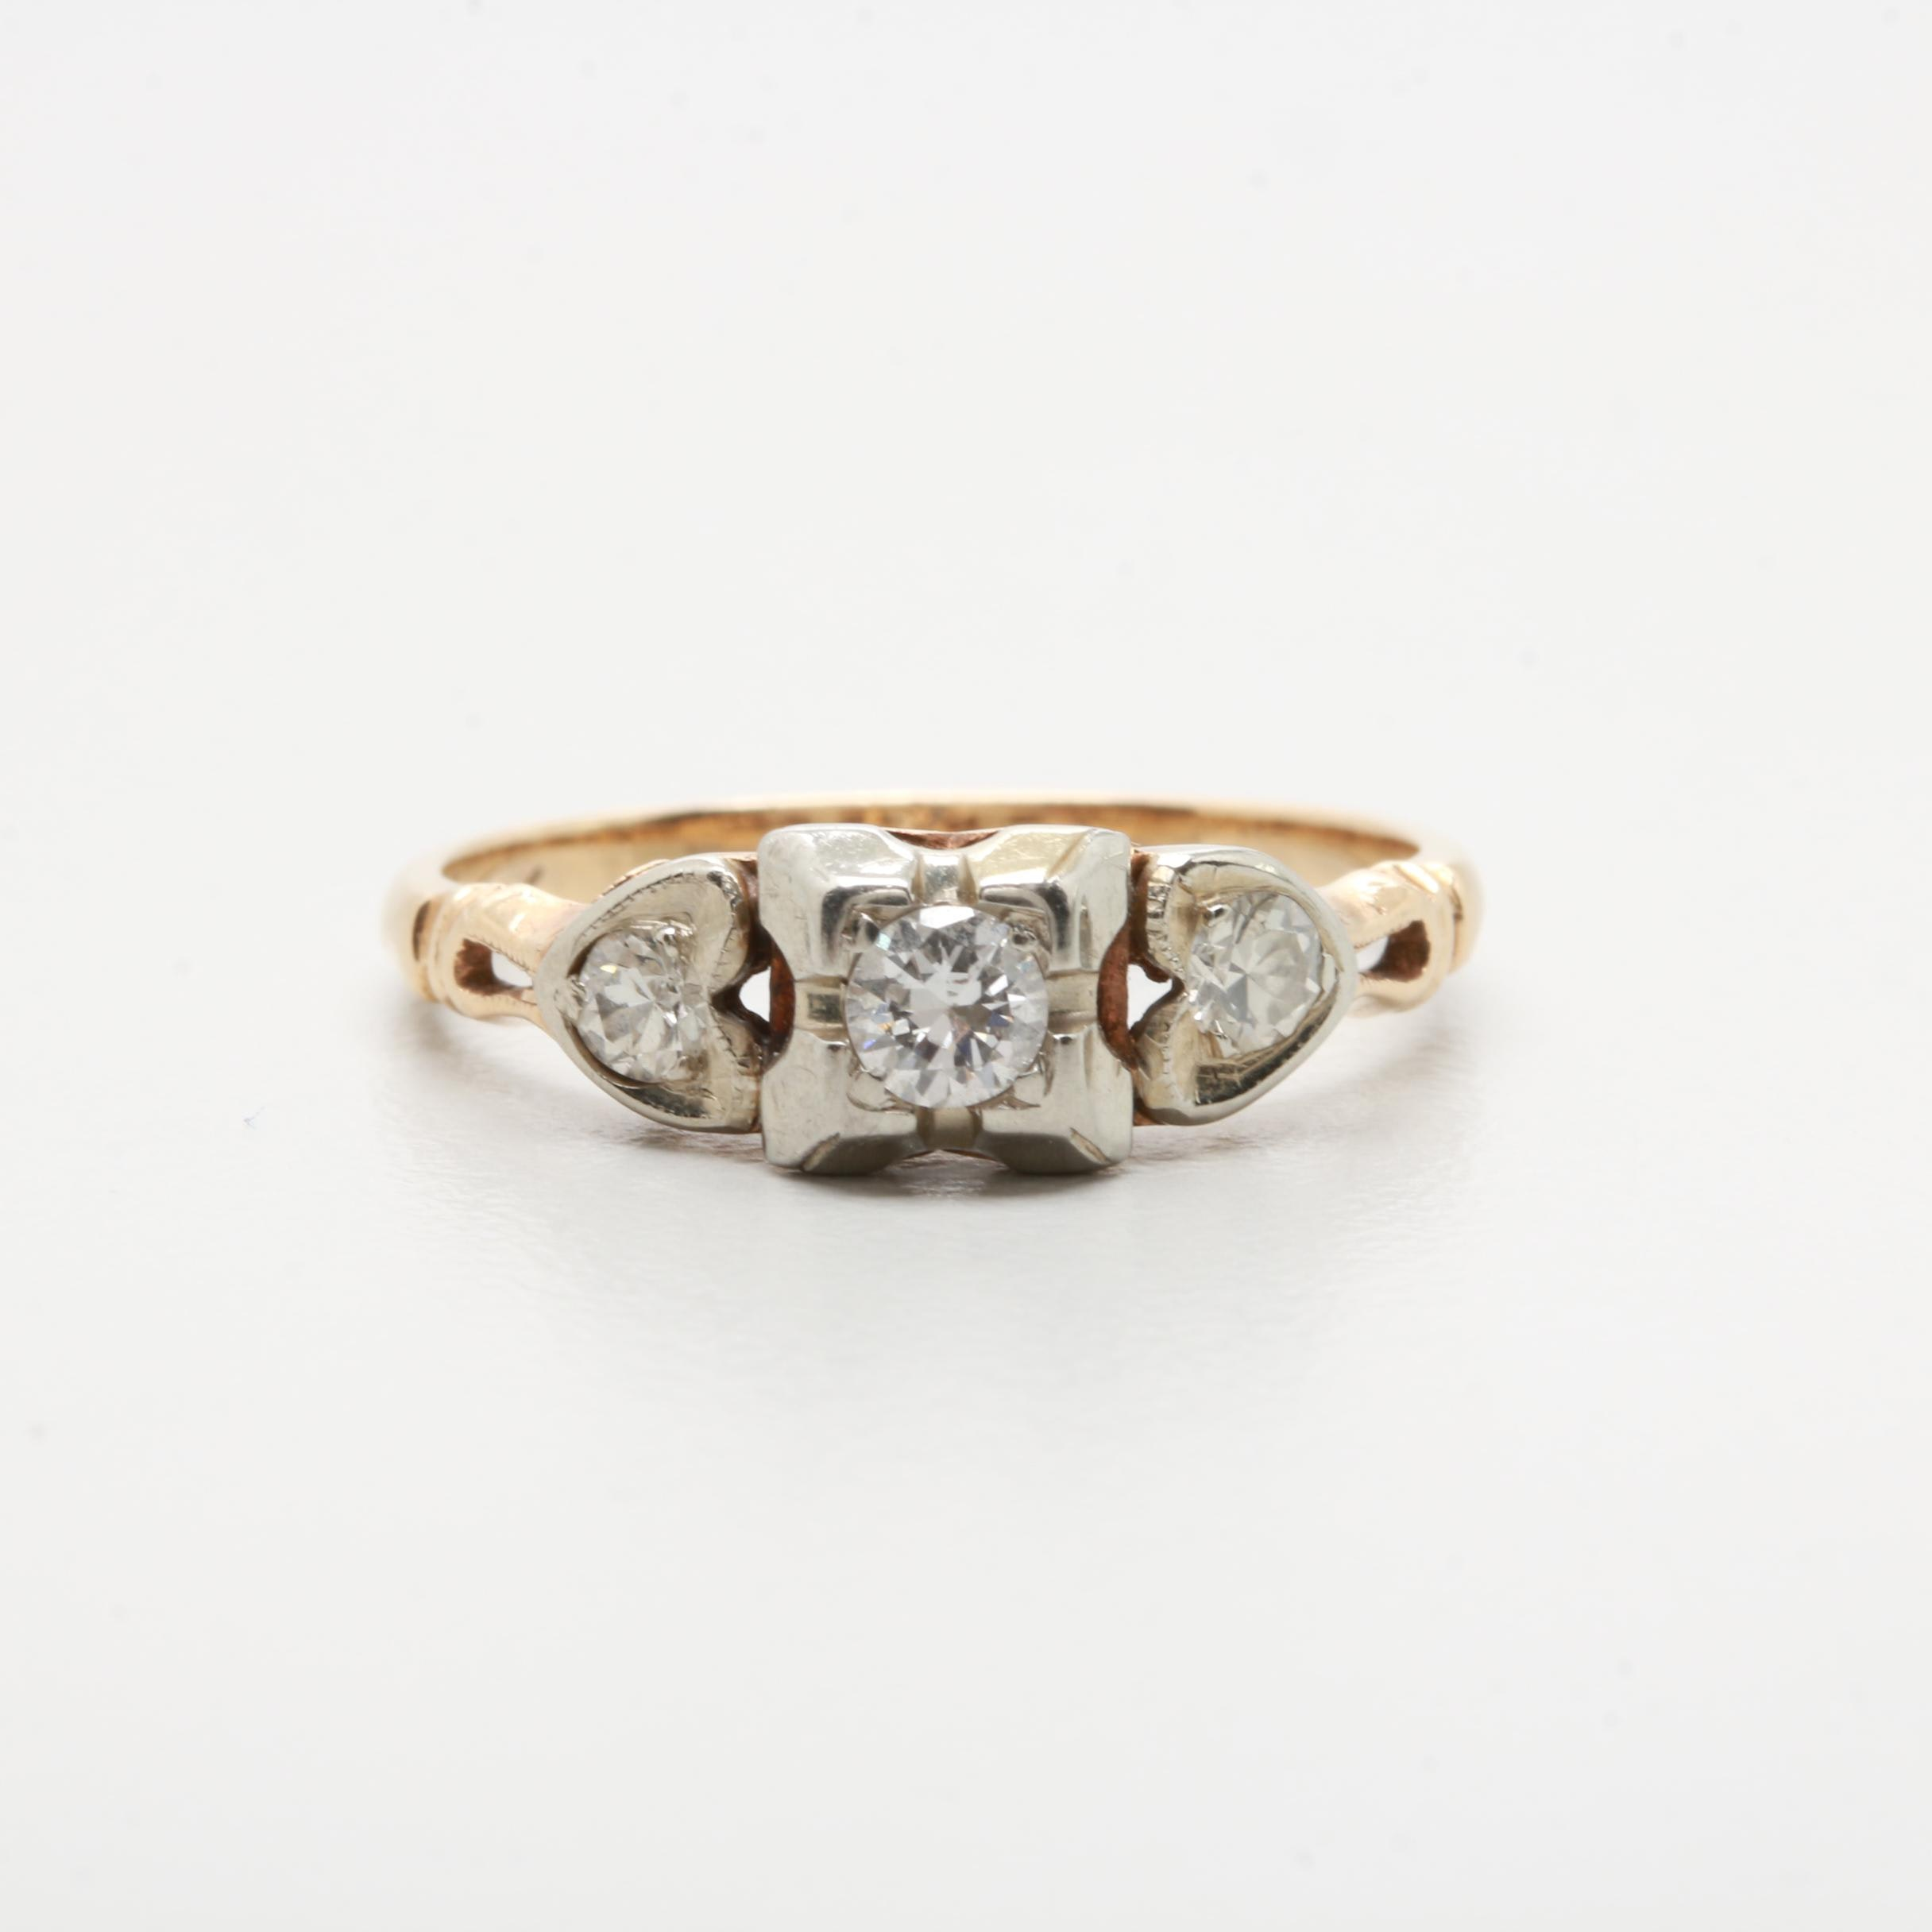 14K Yellow Gold and 18K White Gold Diamond Ring